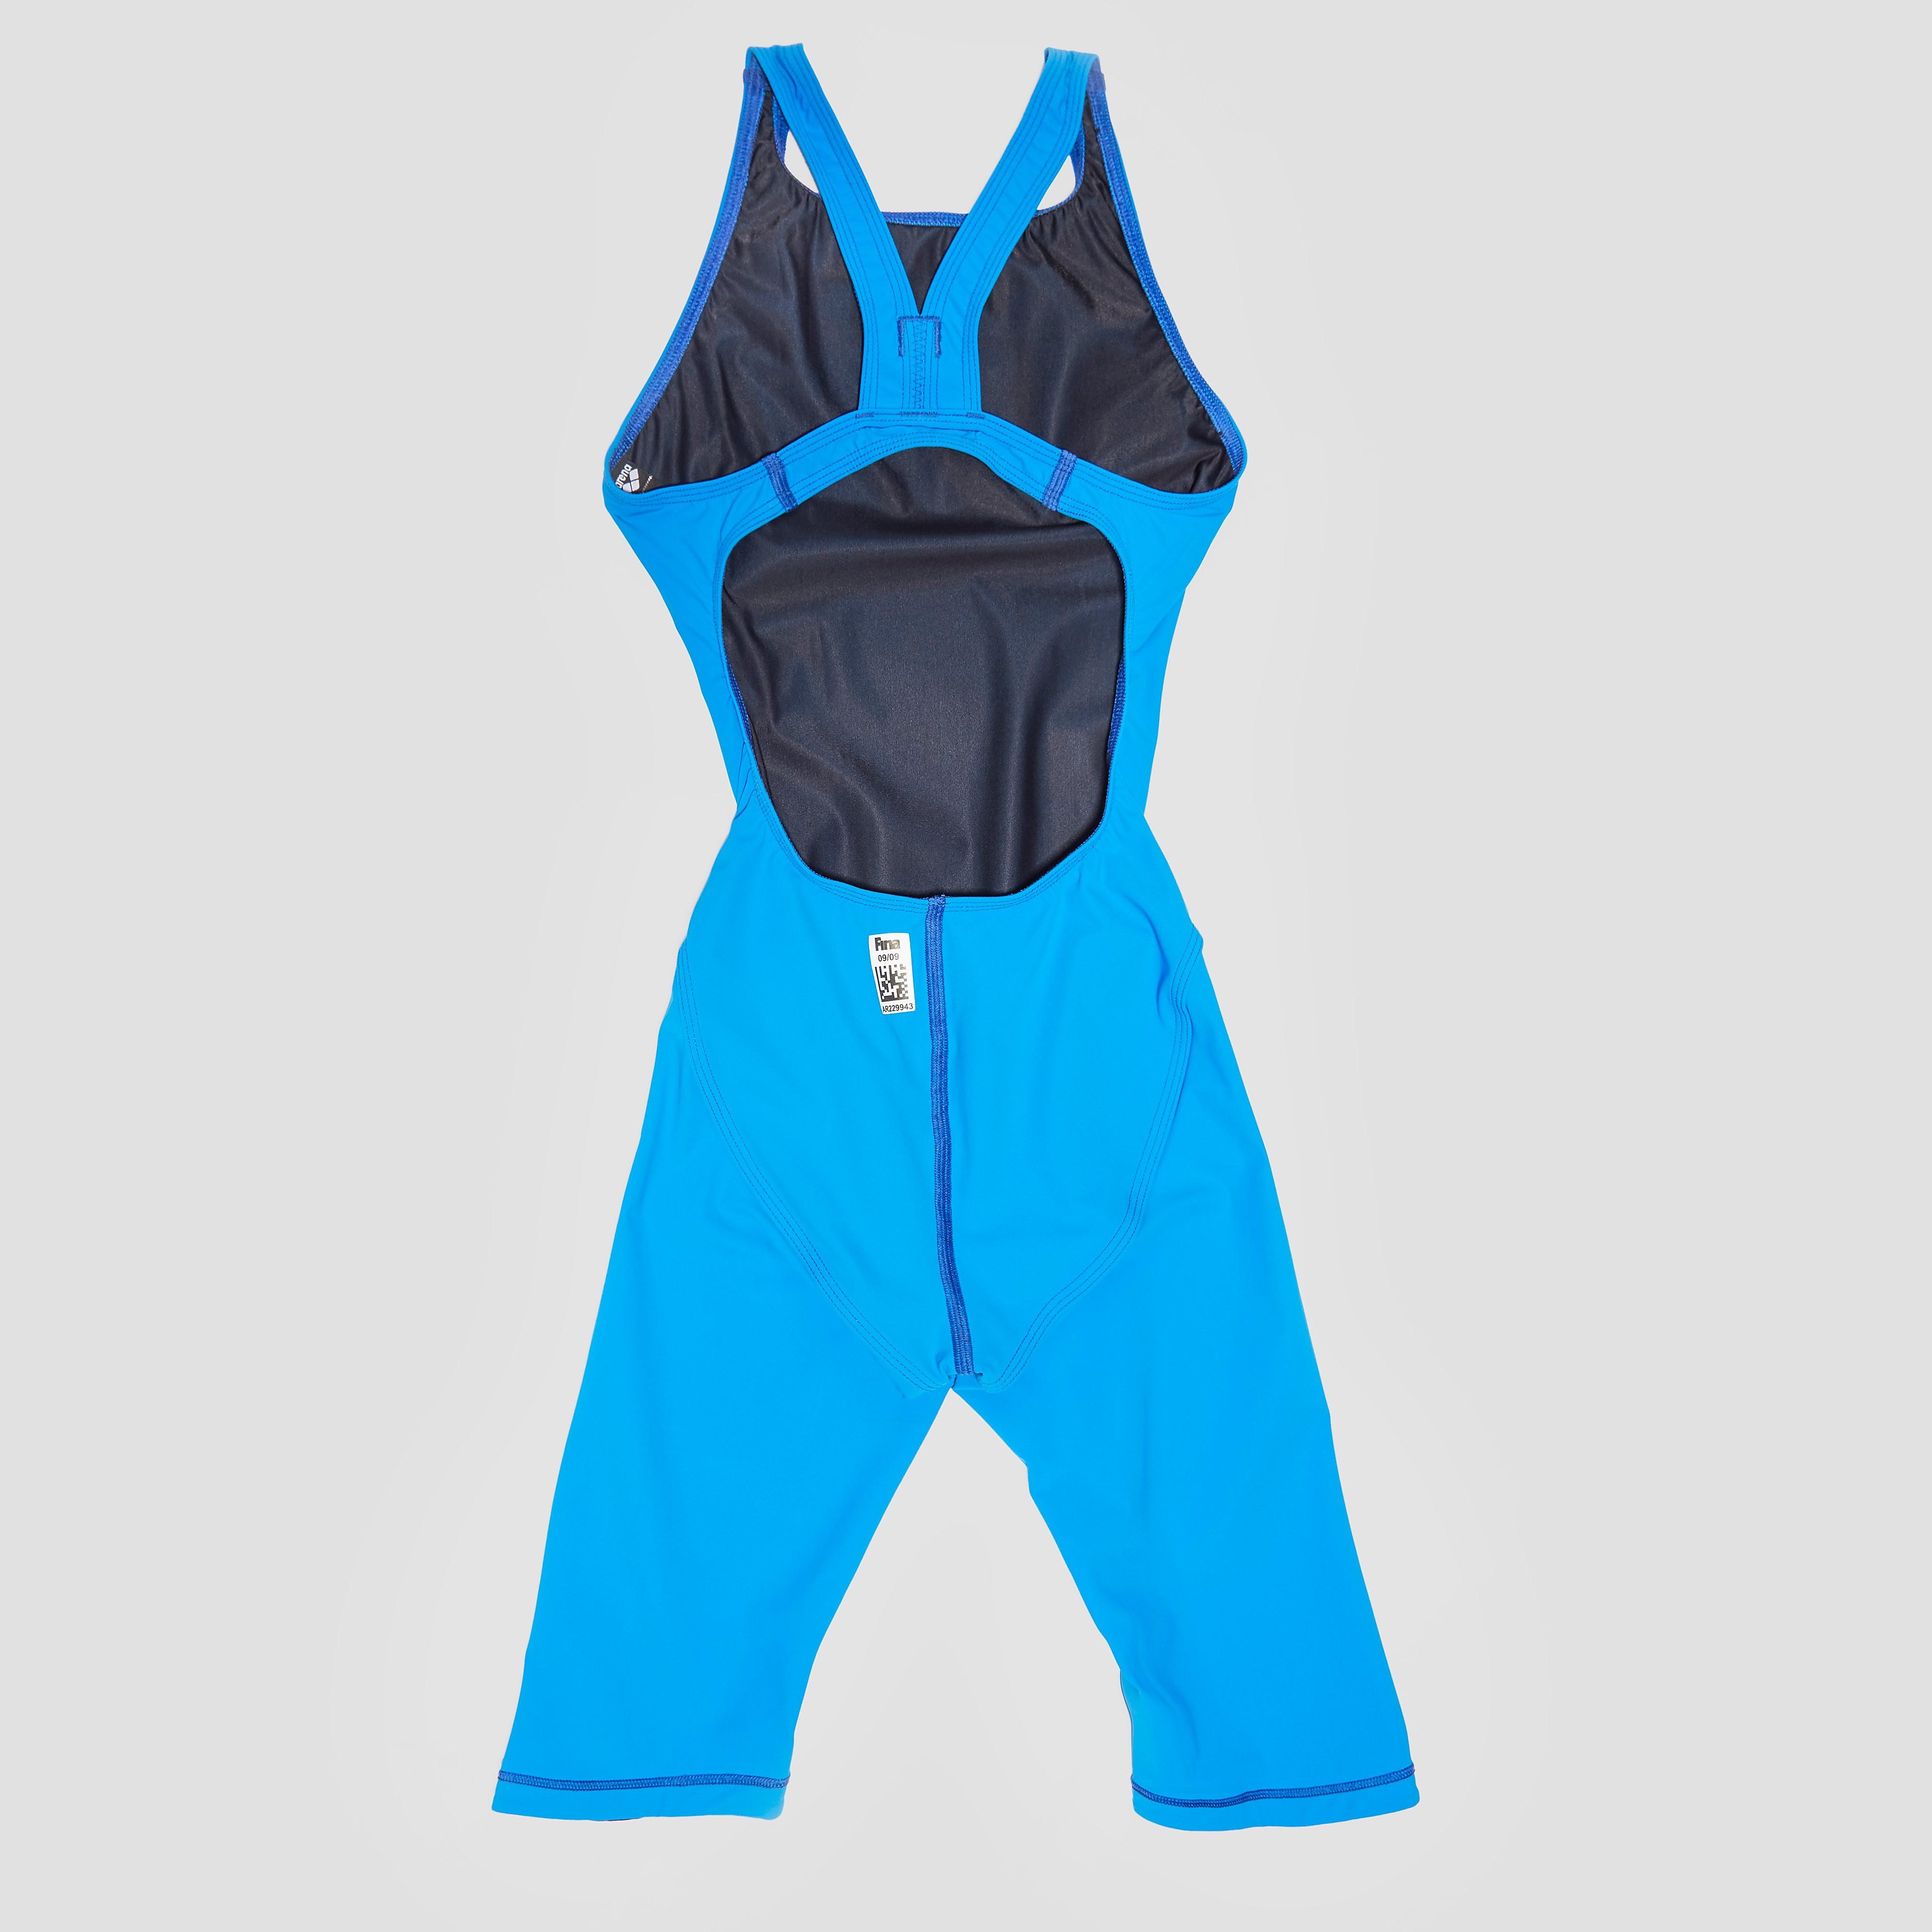 Arena Powerskin ST Short Leg Women's Open Suit